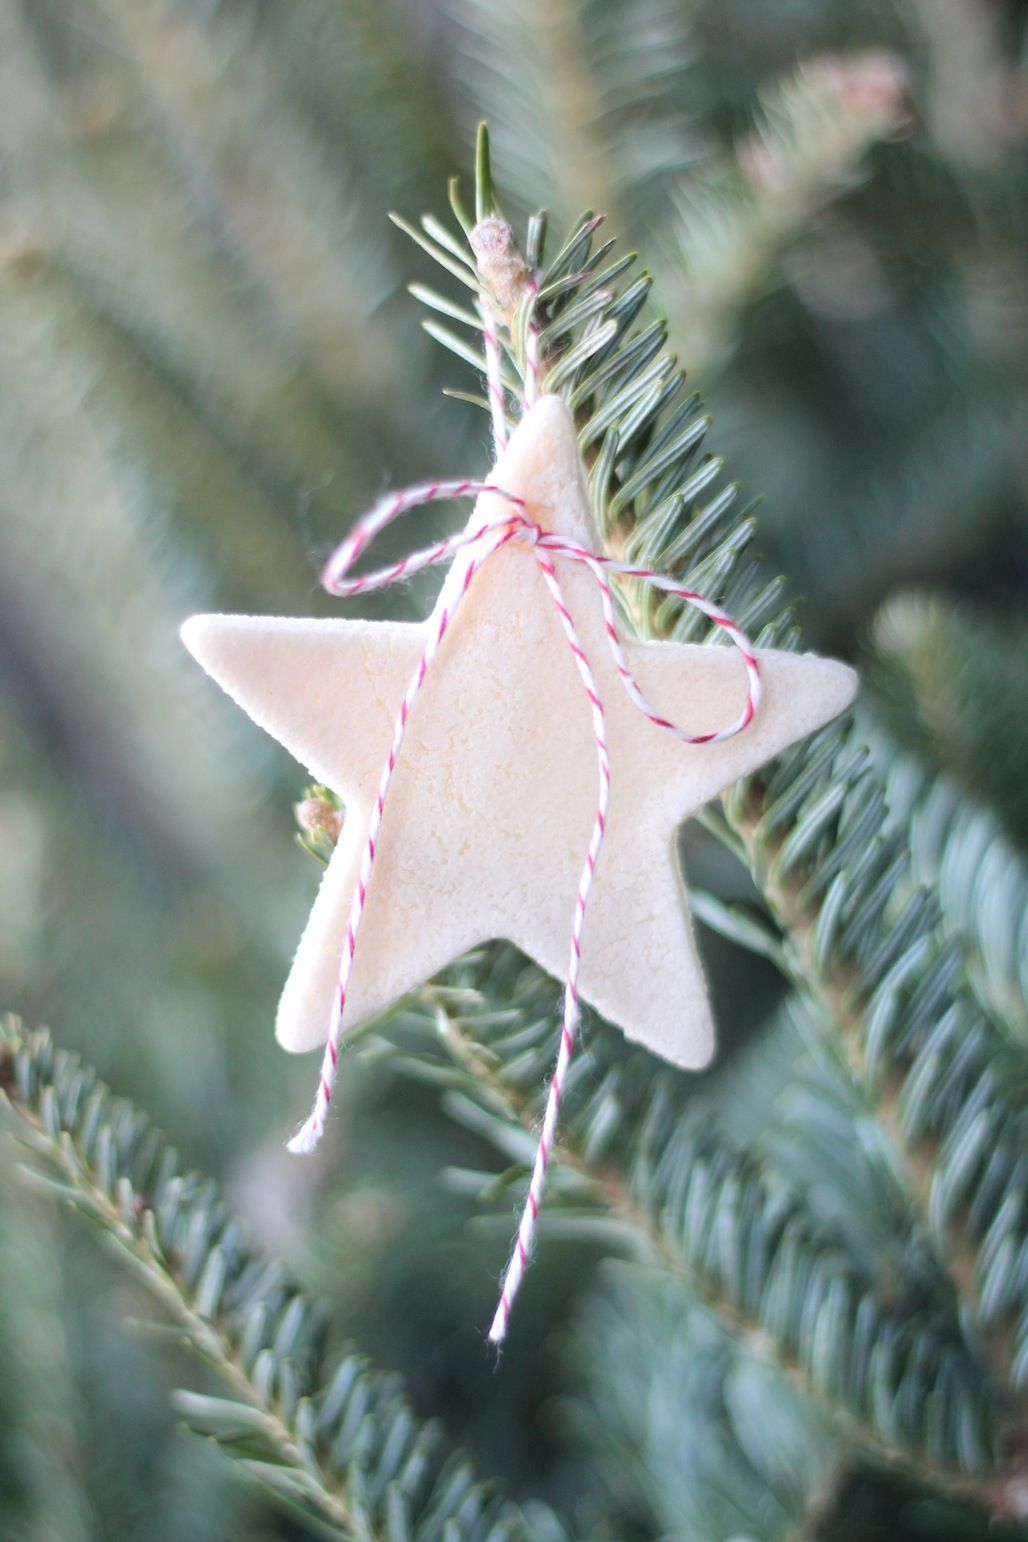 homemade salt dough gift tags / ornaments | a Classic Christmas